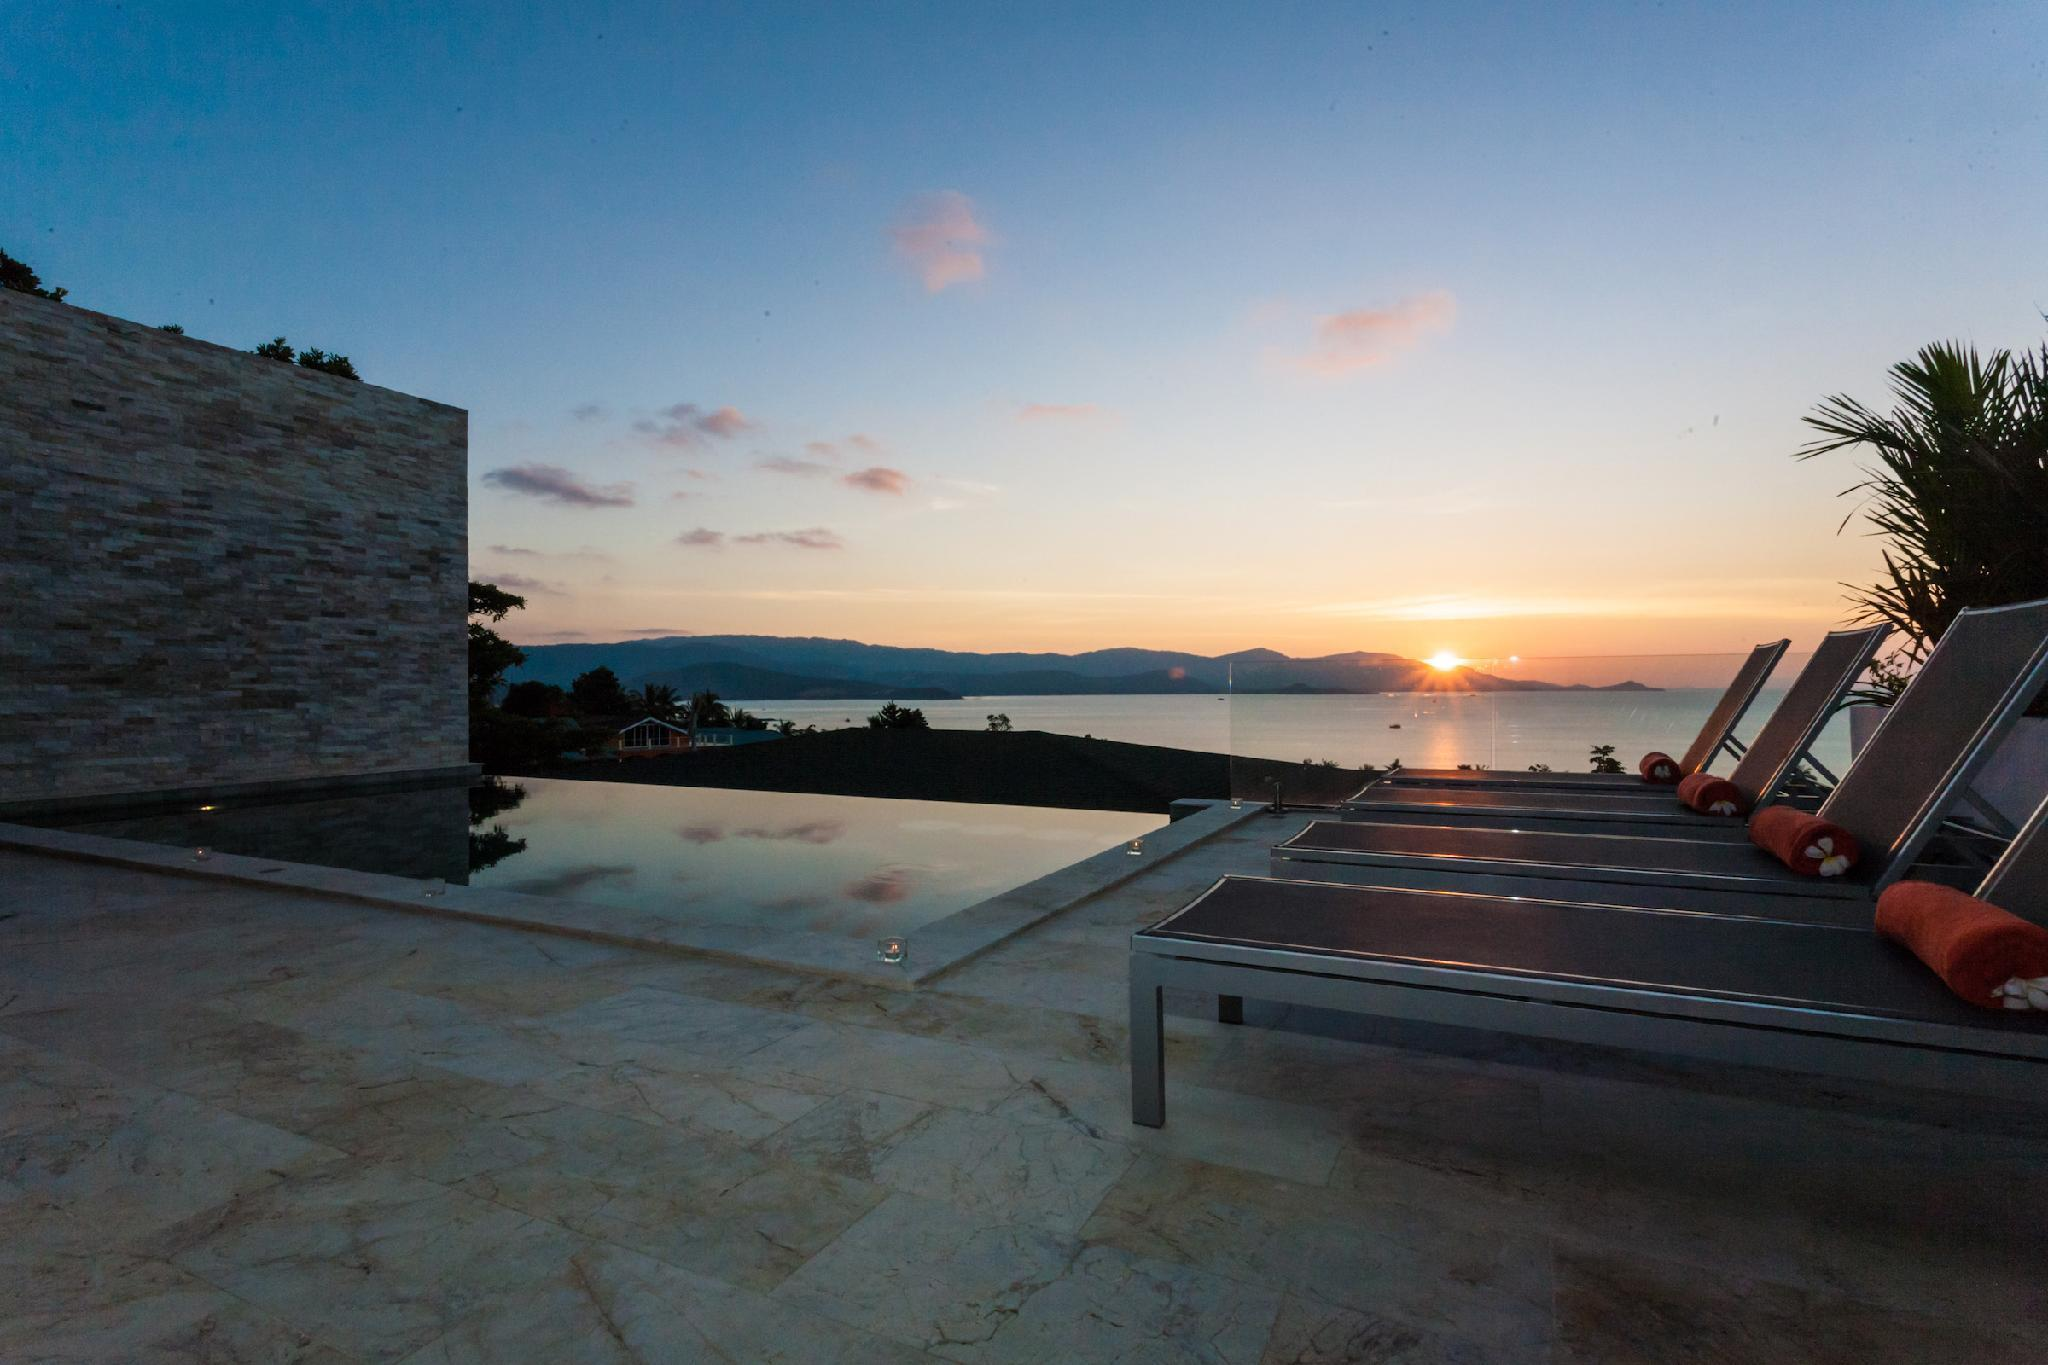 Villa Daizo 3 BDRM Oceanview Infinity Pool Villa Daizo 3 BDRM Oceanview Infinity Pool